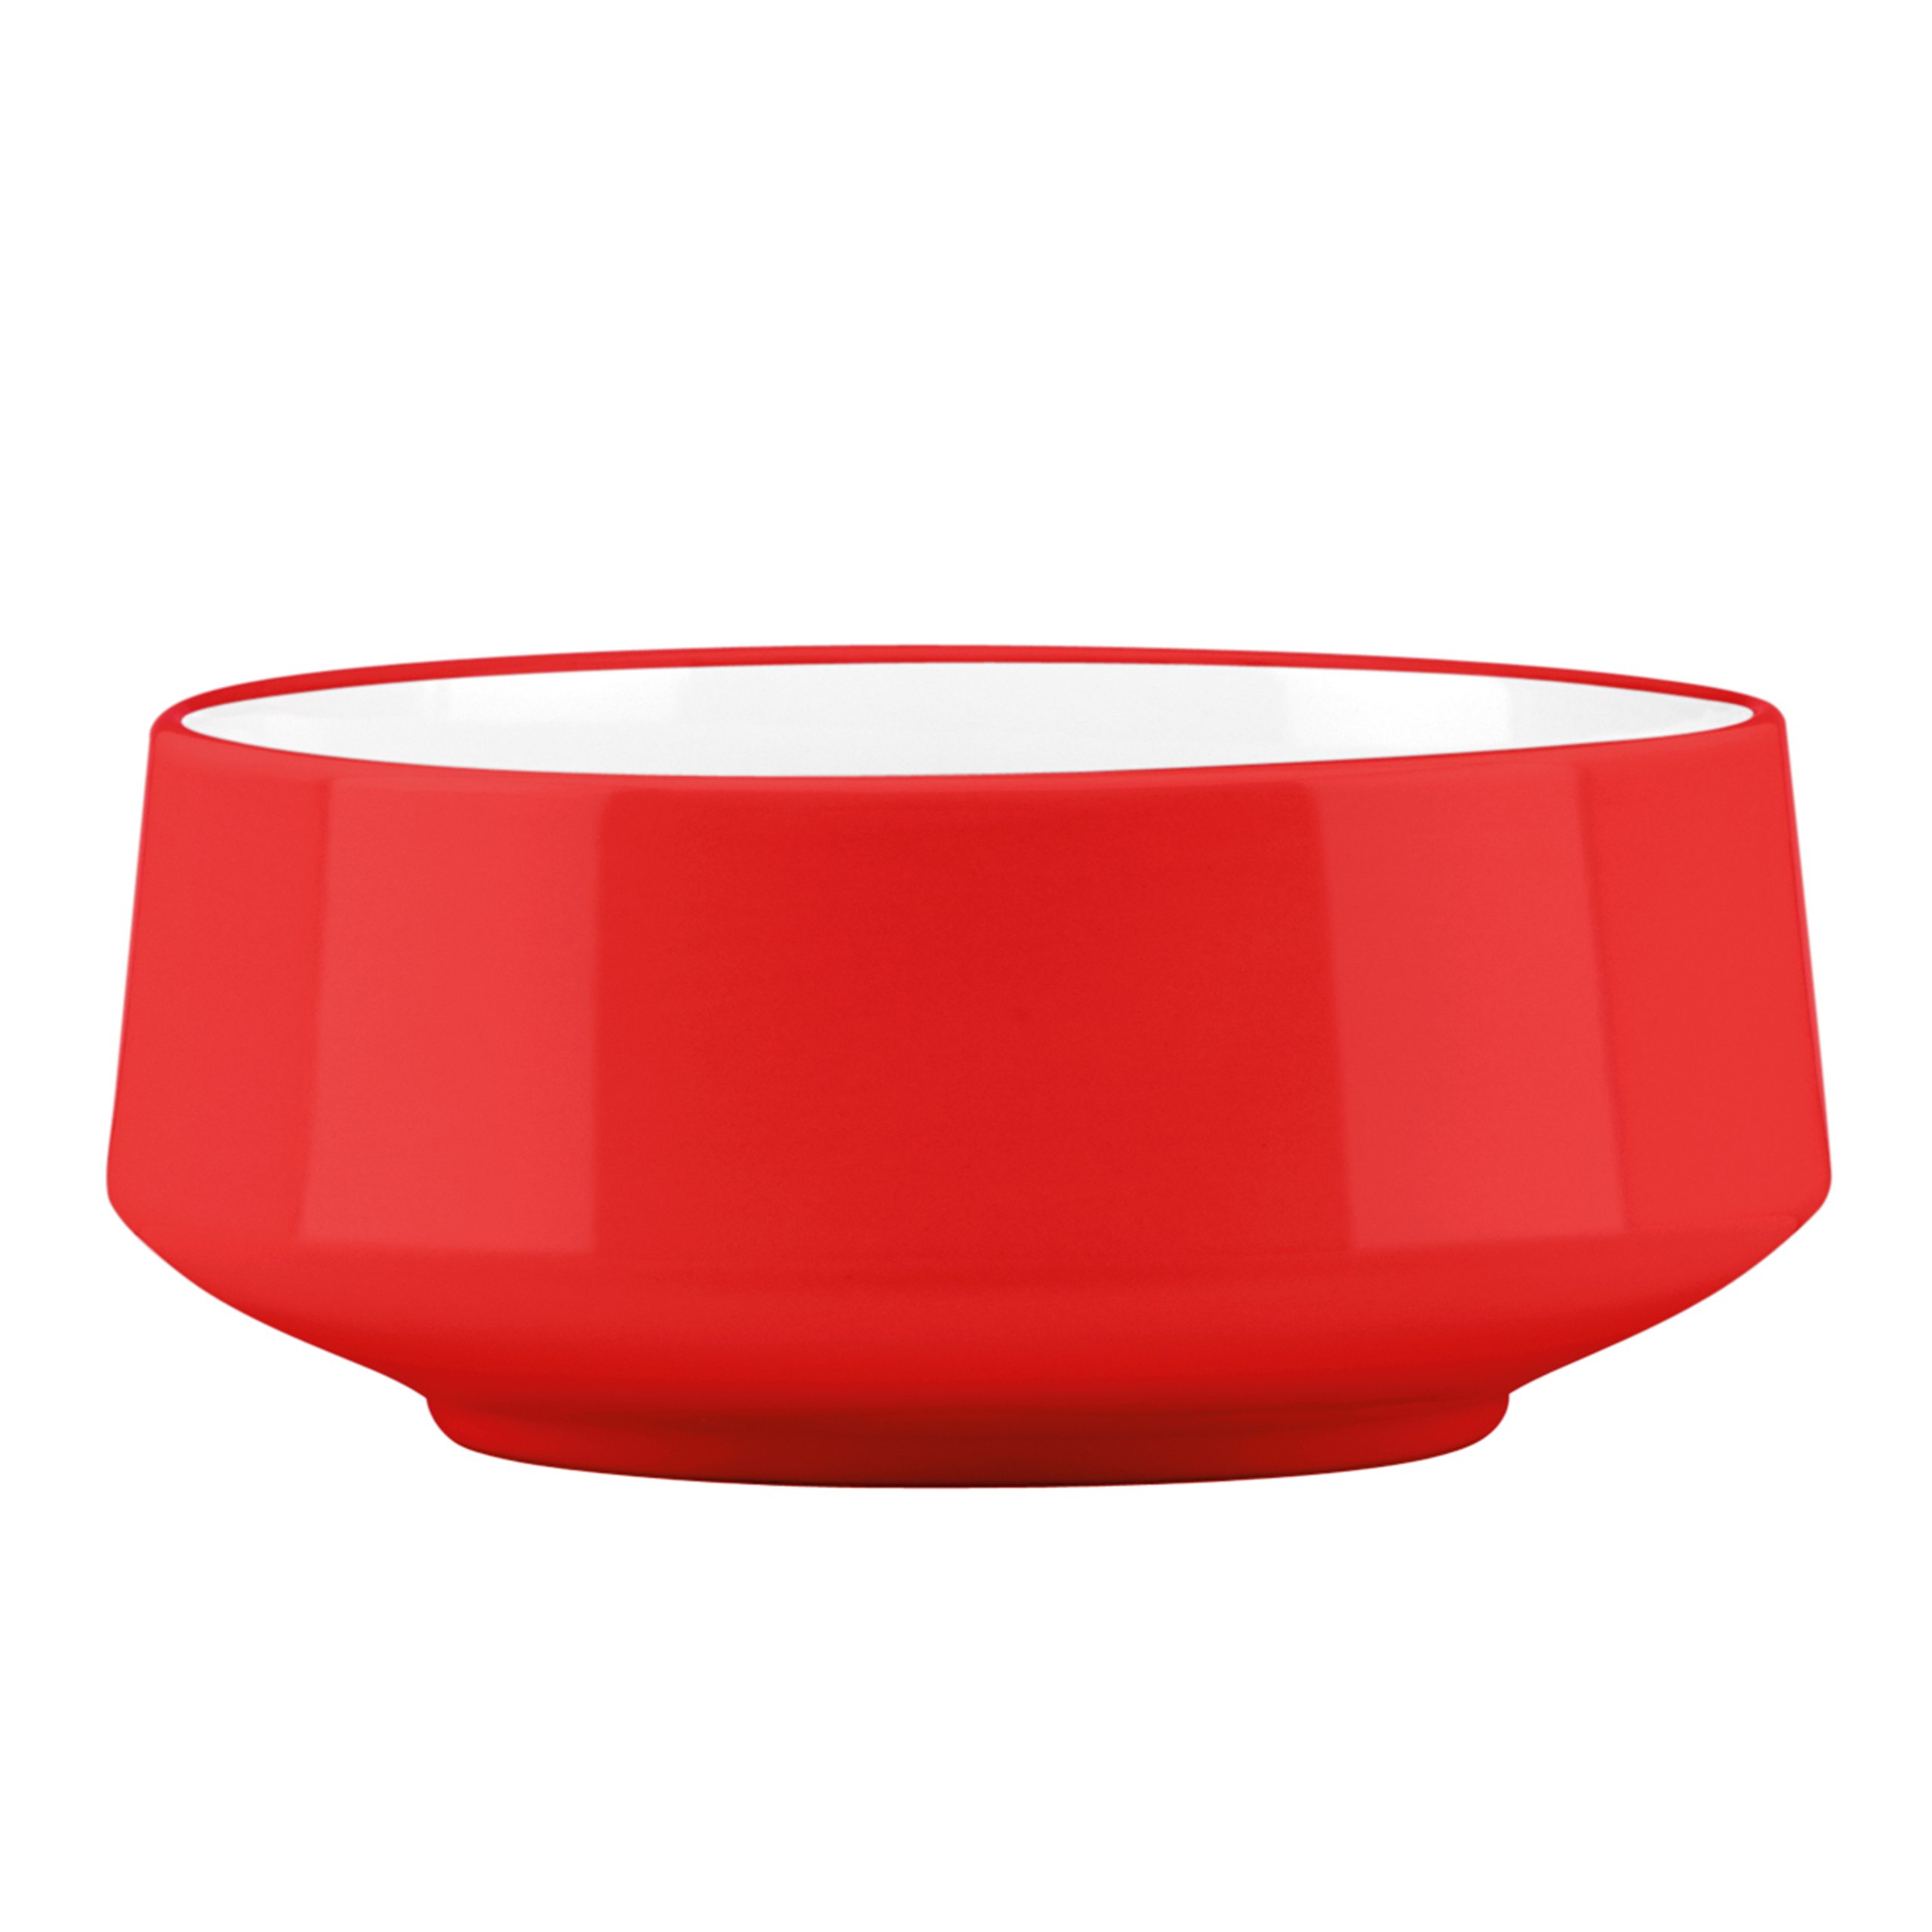 DANSK Kobenstyle All-Purpose Bowl, Chili Red